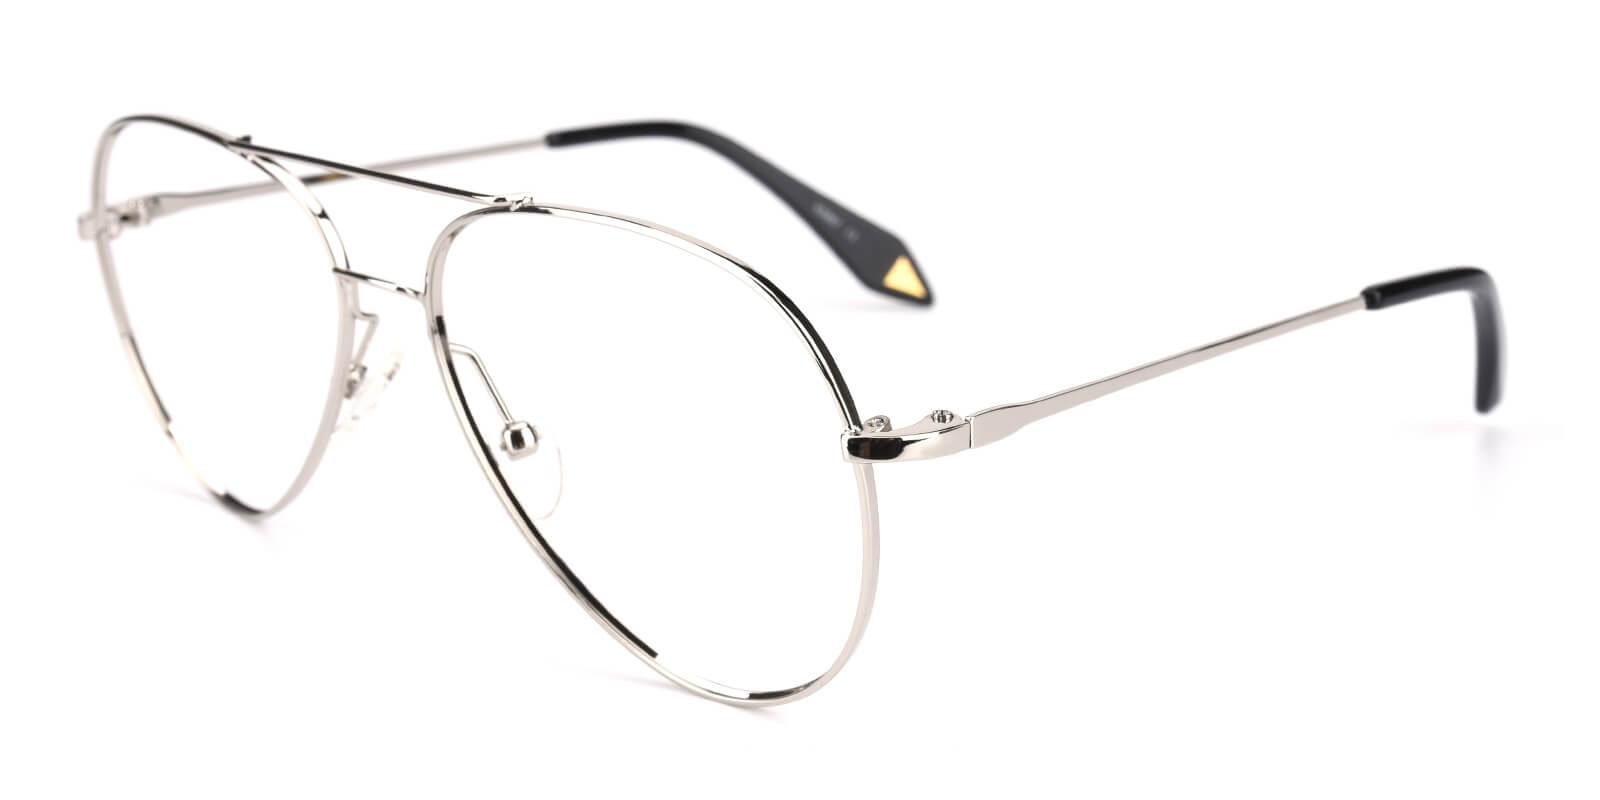 Pilot-Silver-Aviator-Metal-Eyeglasses-additional1